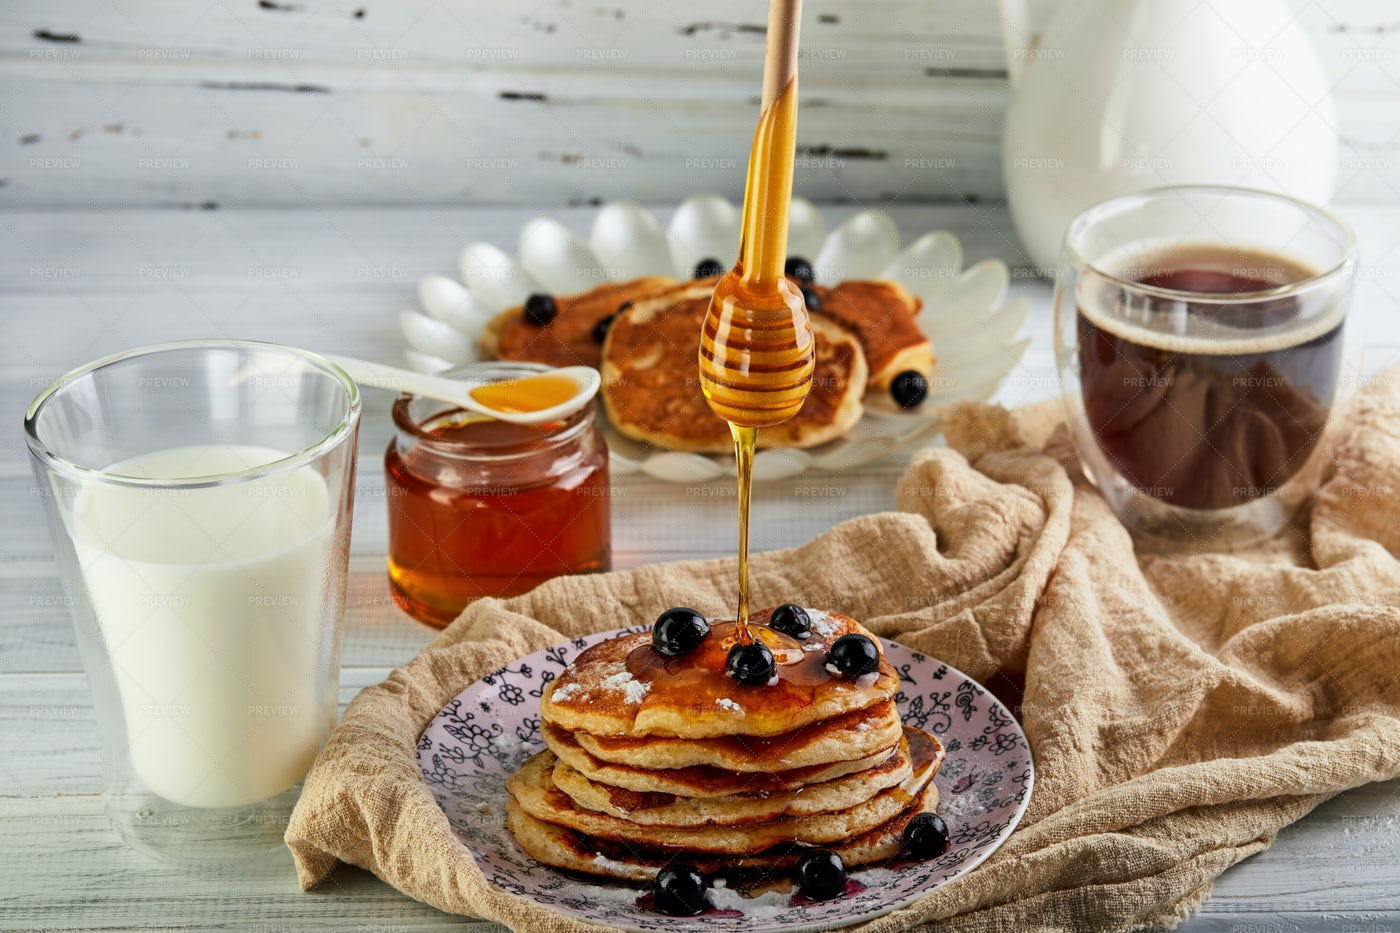 Honey For The Pancakes: Stock Photos